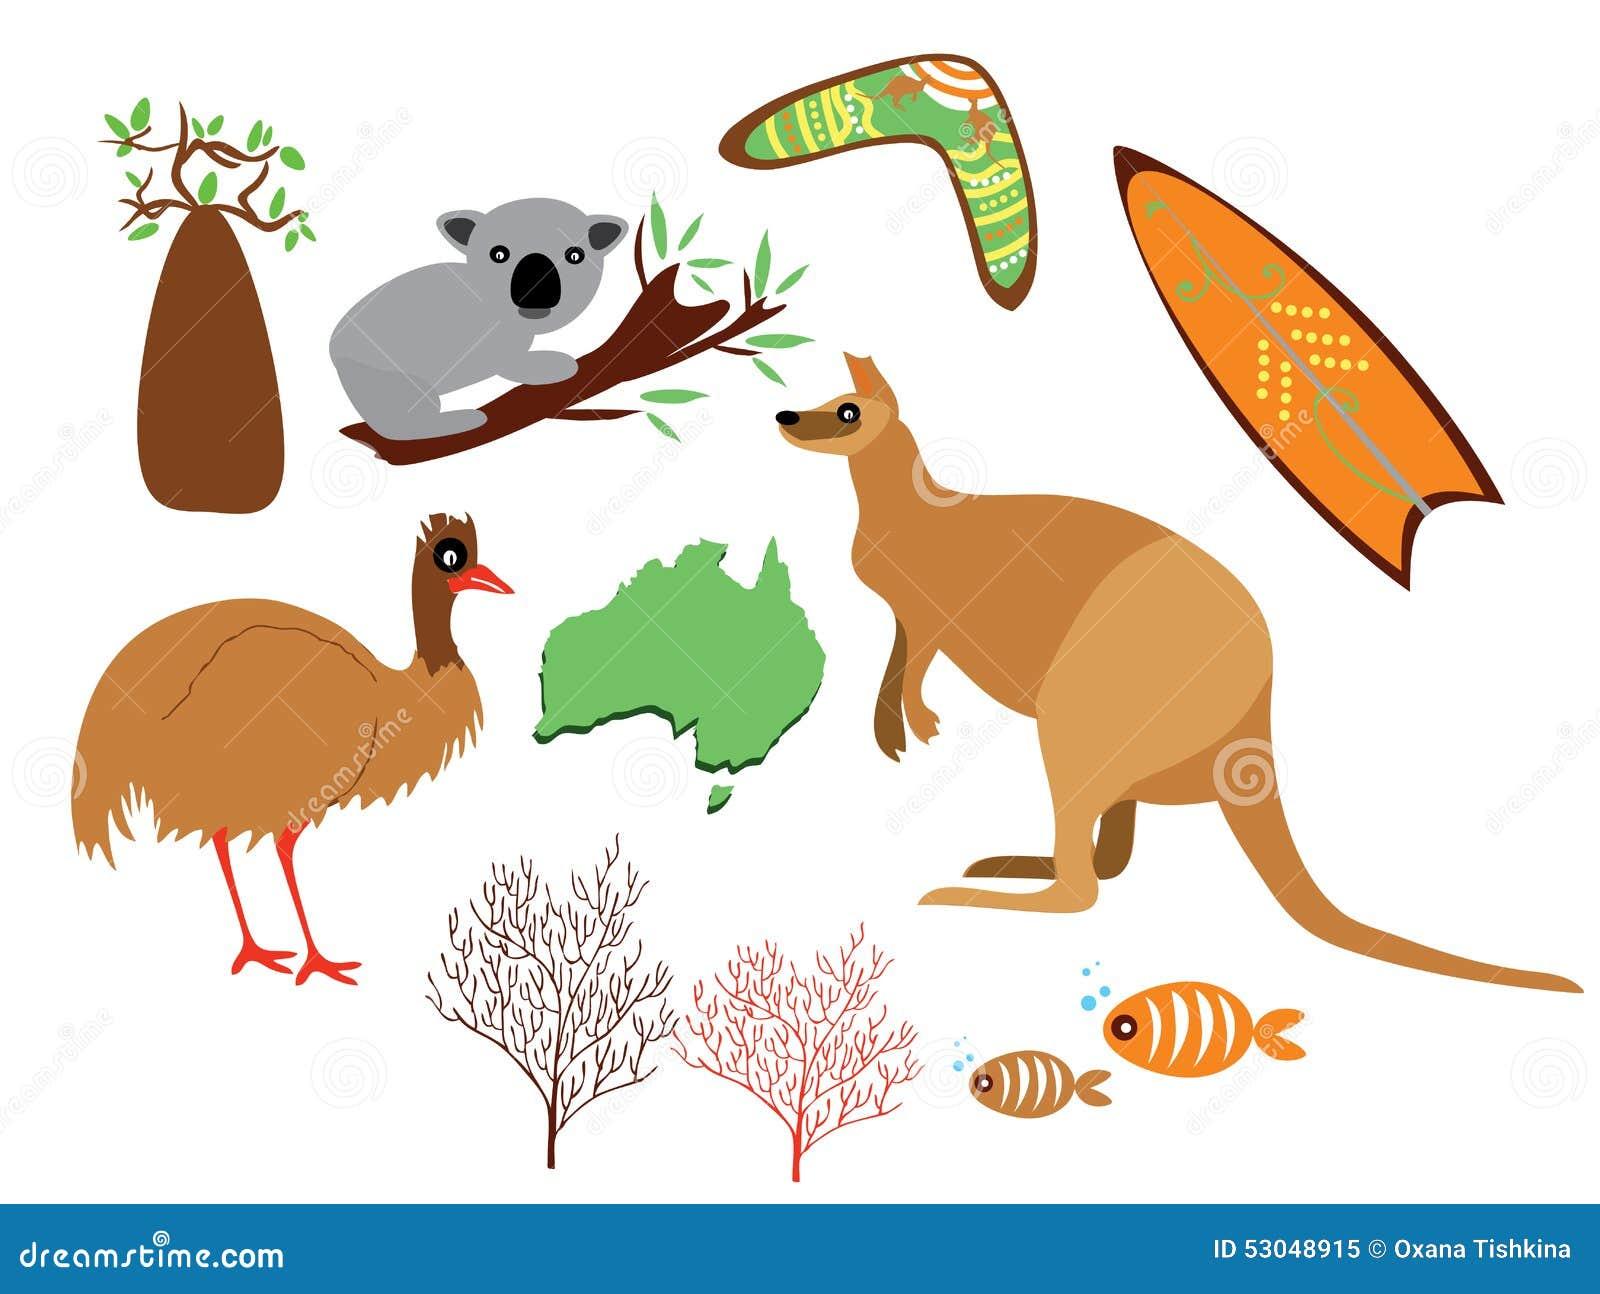 Australia Set Stock Vector Illustration Of Card Decor 53048915